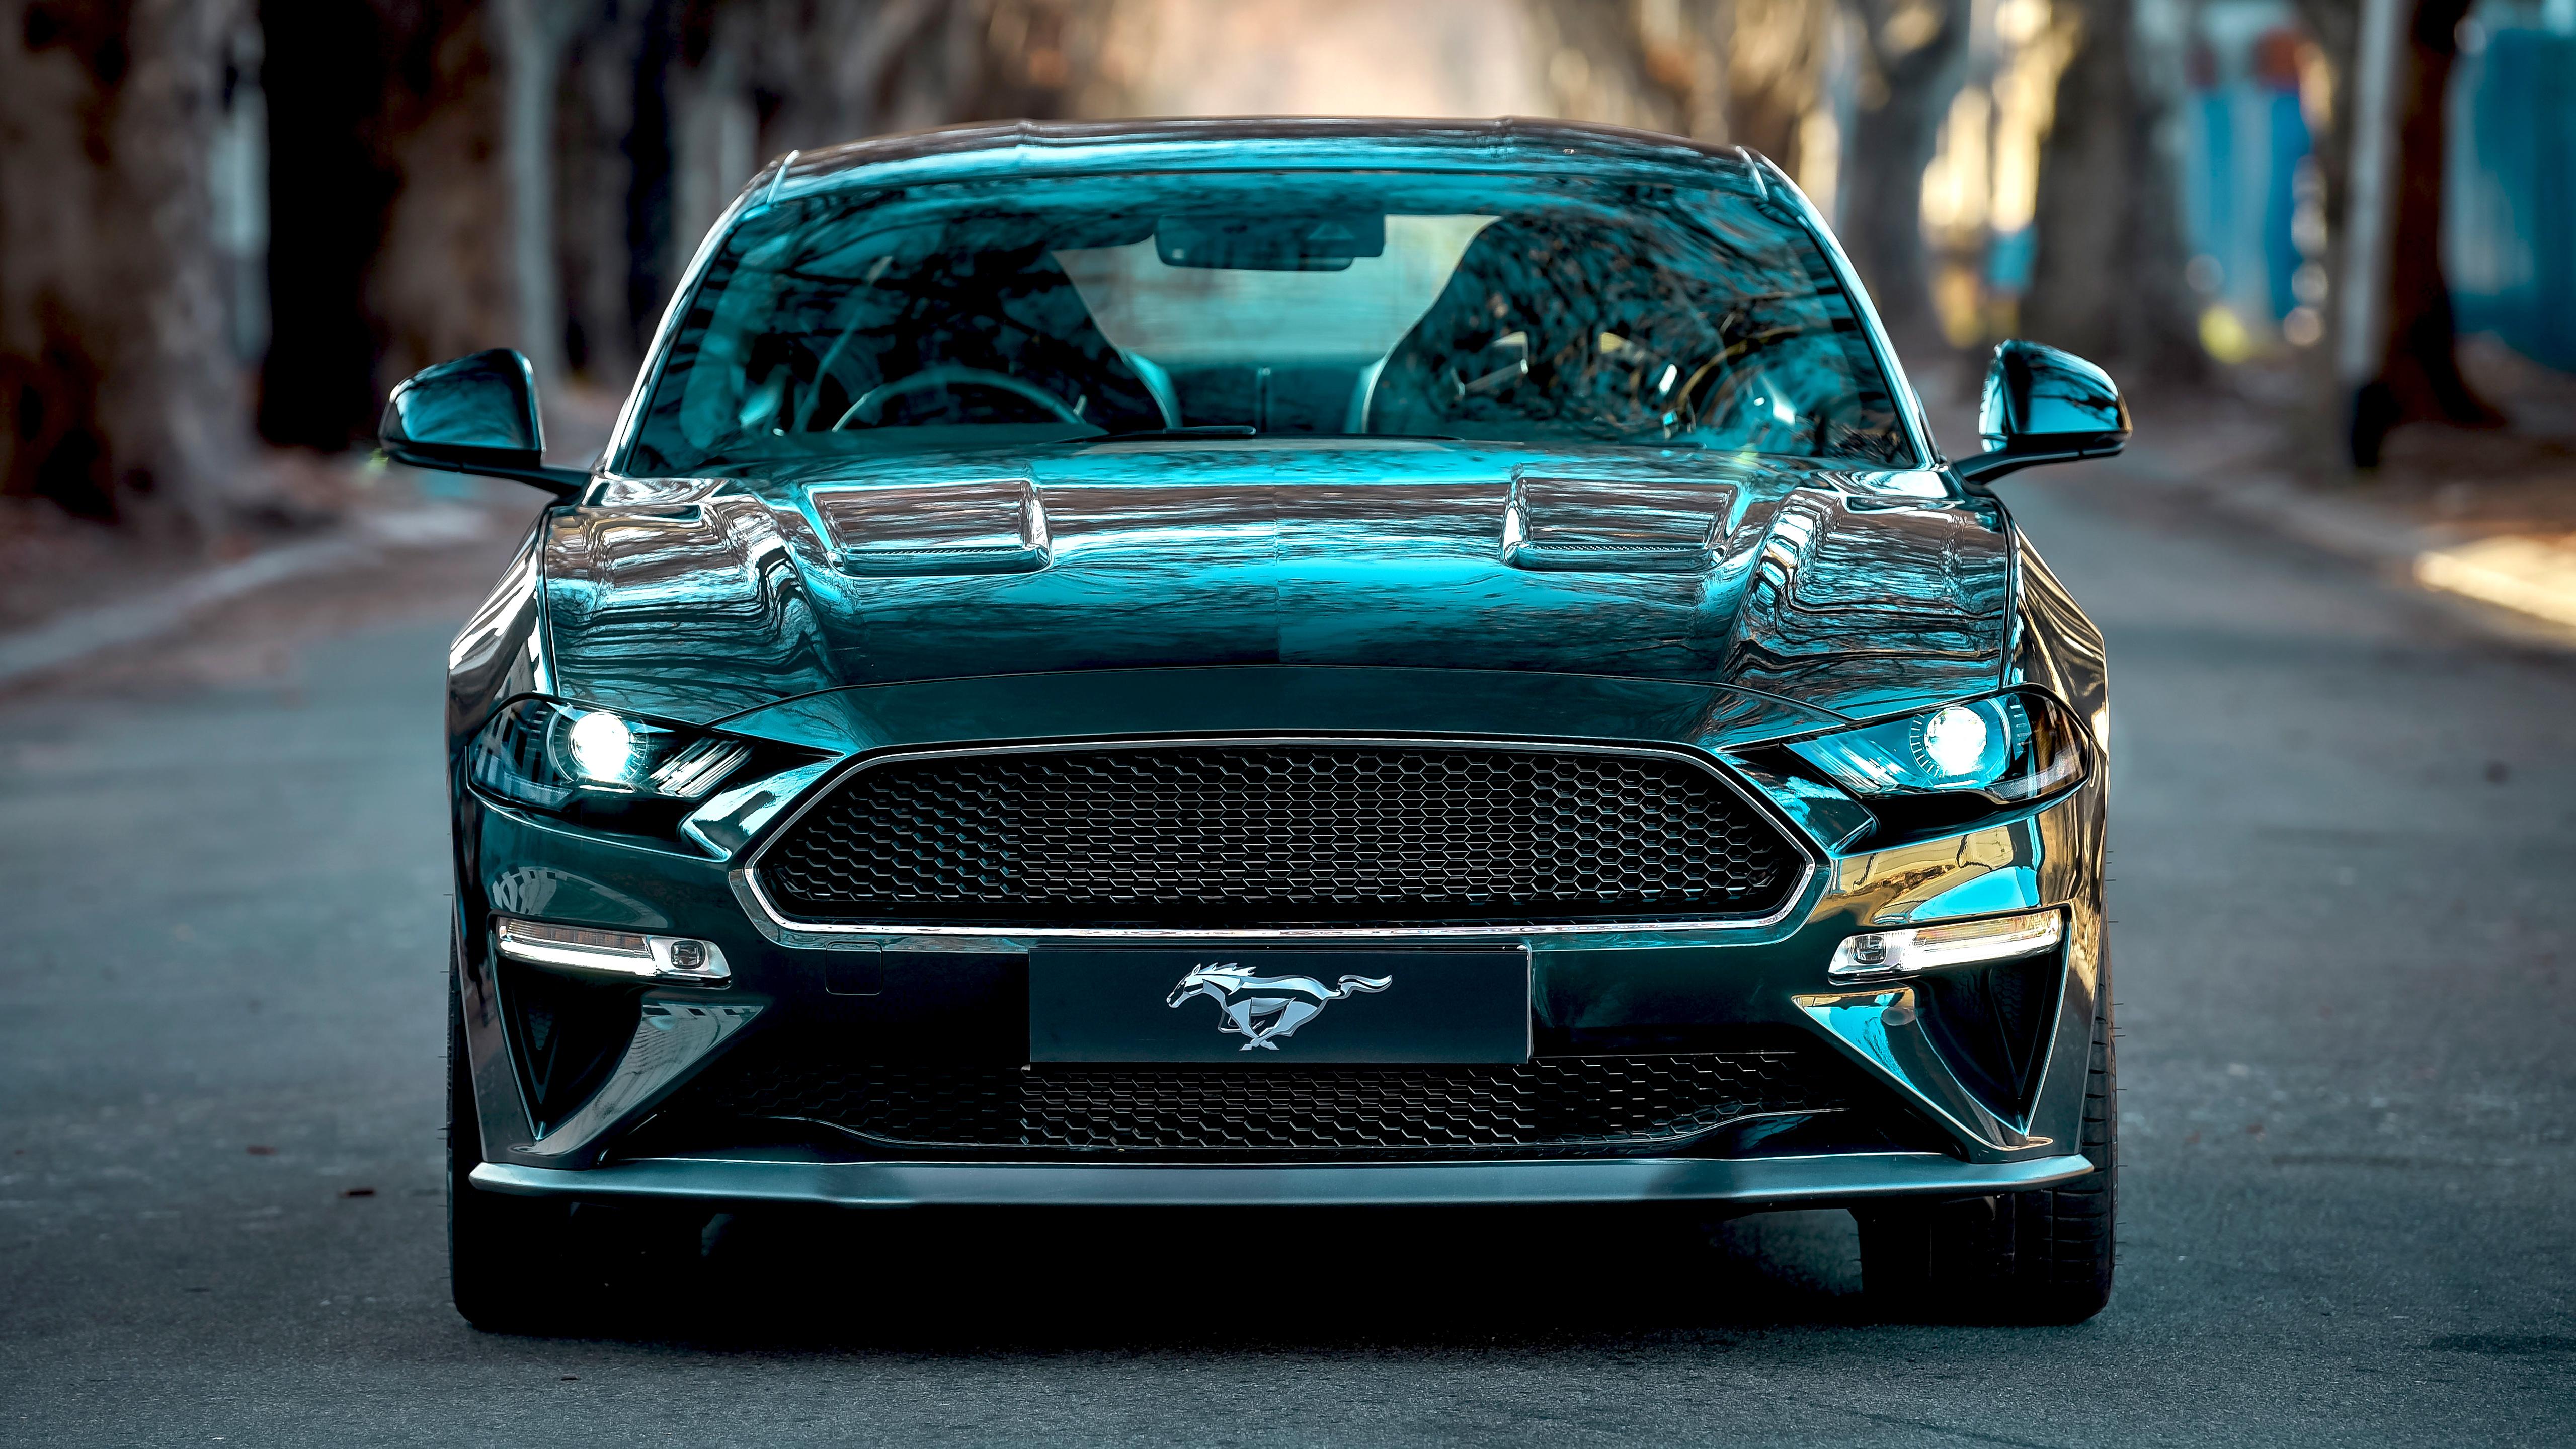 Ford Mustang Bullitt 2019 4k 3 Wallpaper Hd Car Wallpapers Id 12962